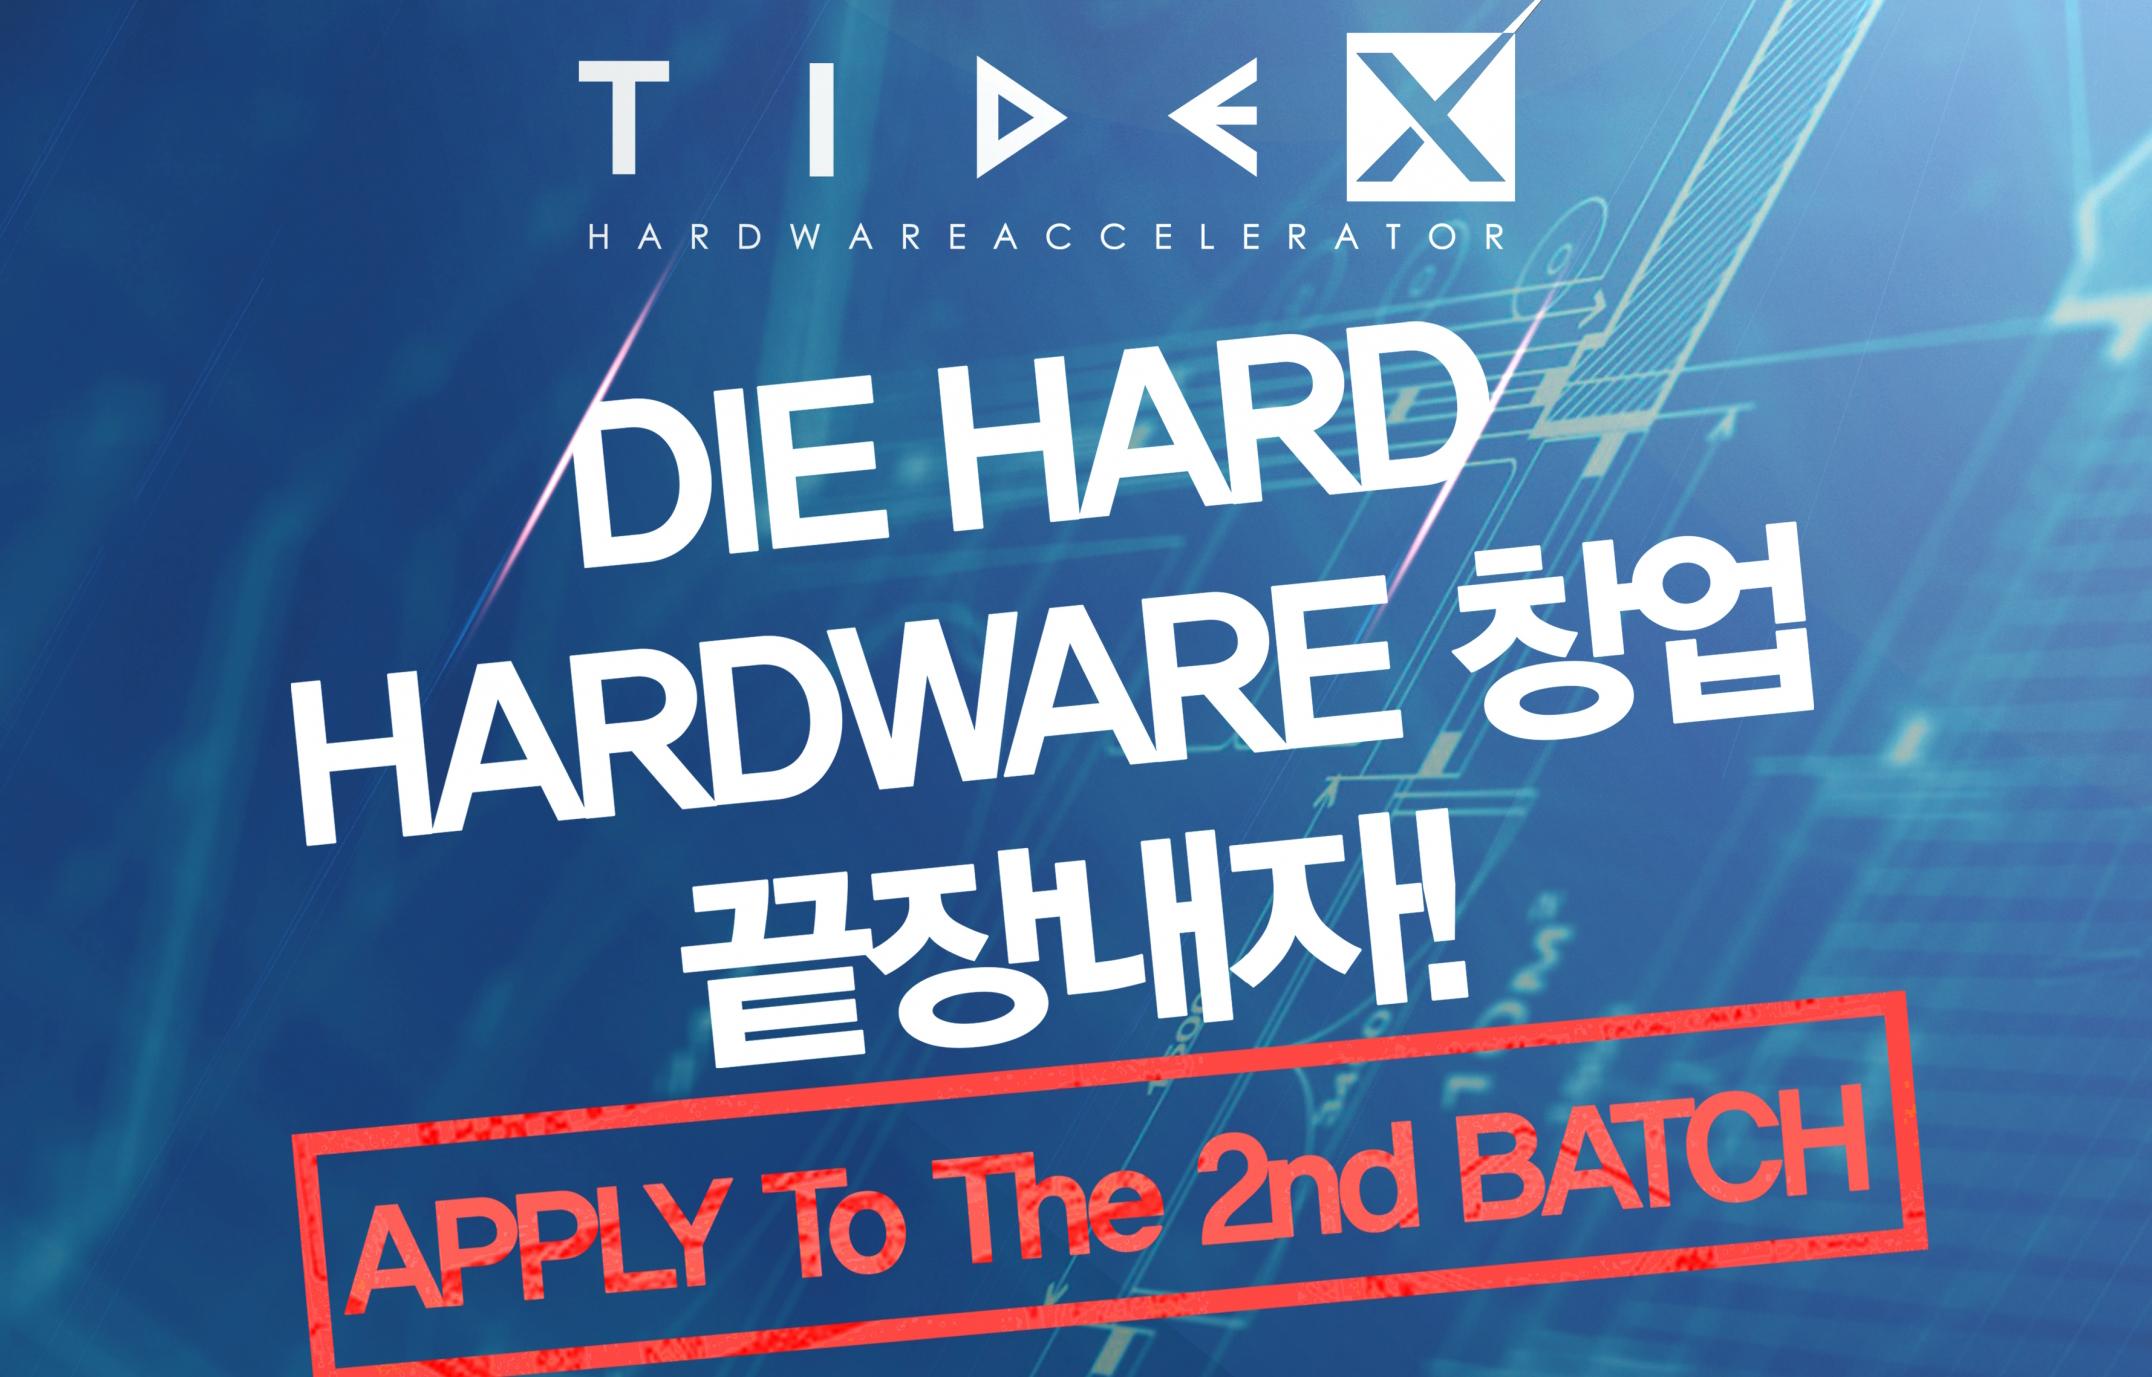 TIDE-X Hardware Accelerator